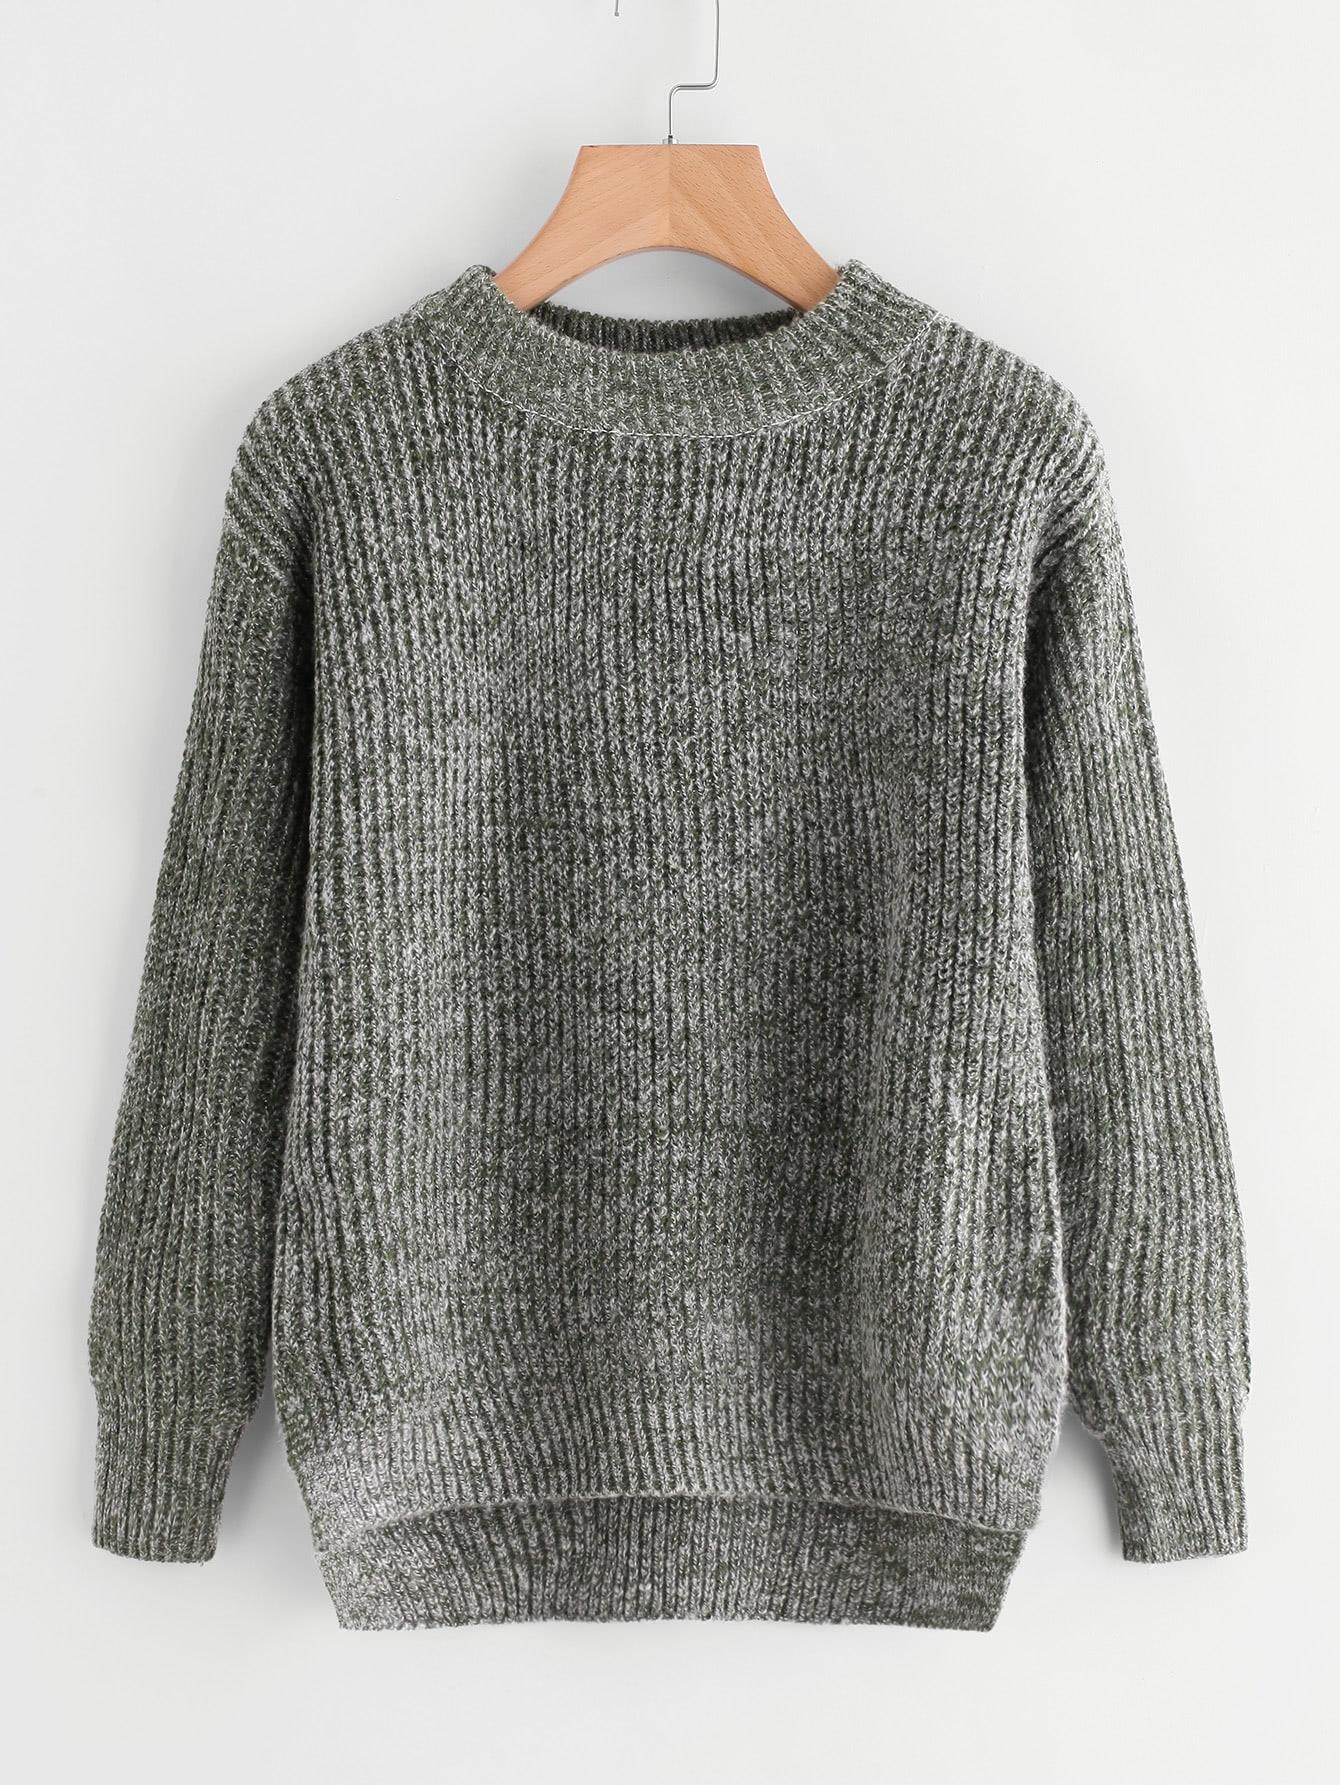 Slit Side High Low Space Dye Sweater